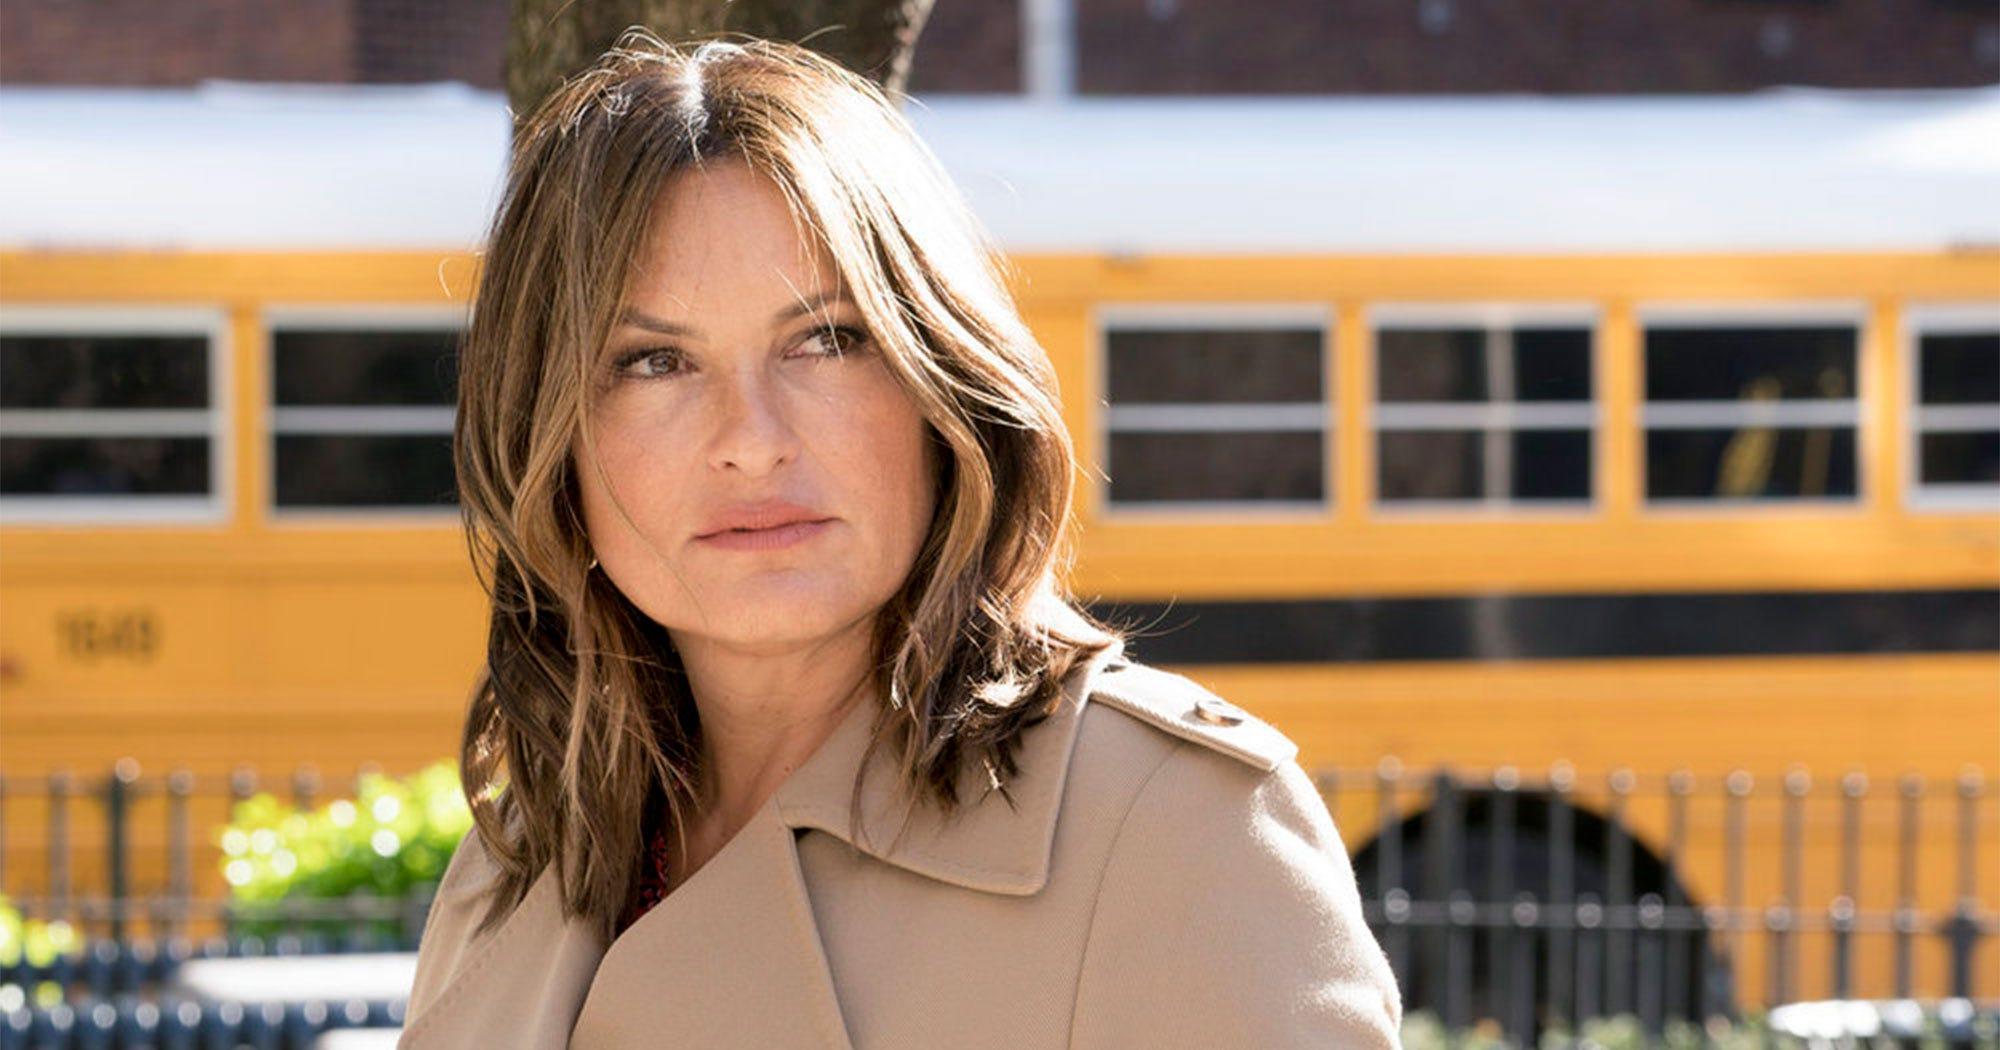 Law & Order SVU Has More Women Writers For Season 21